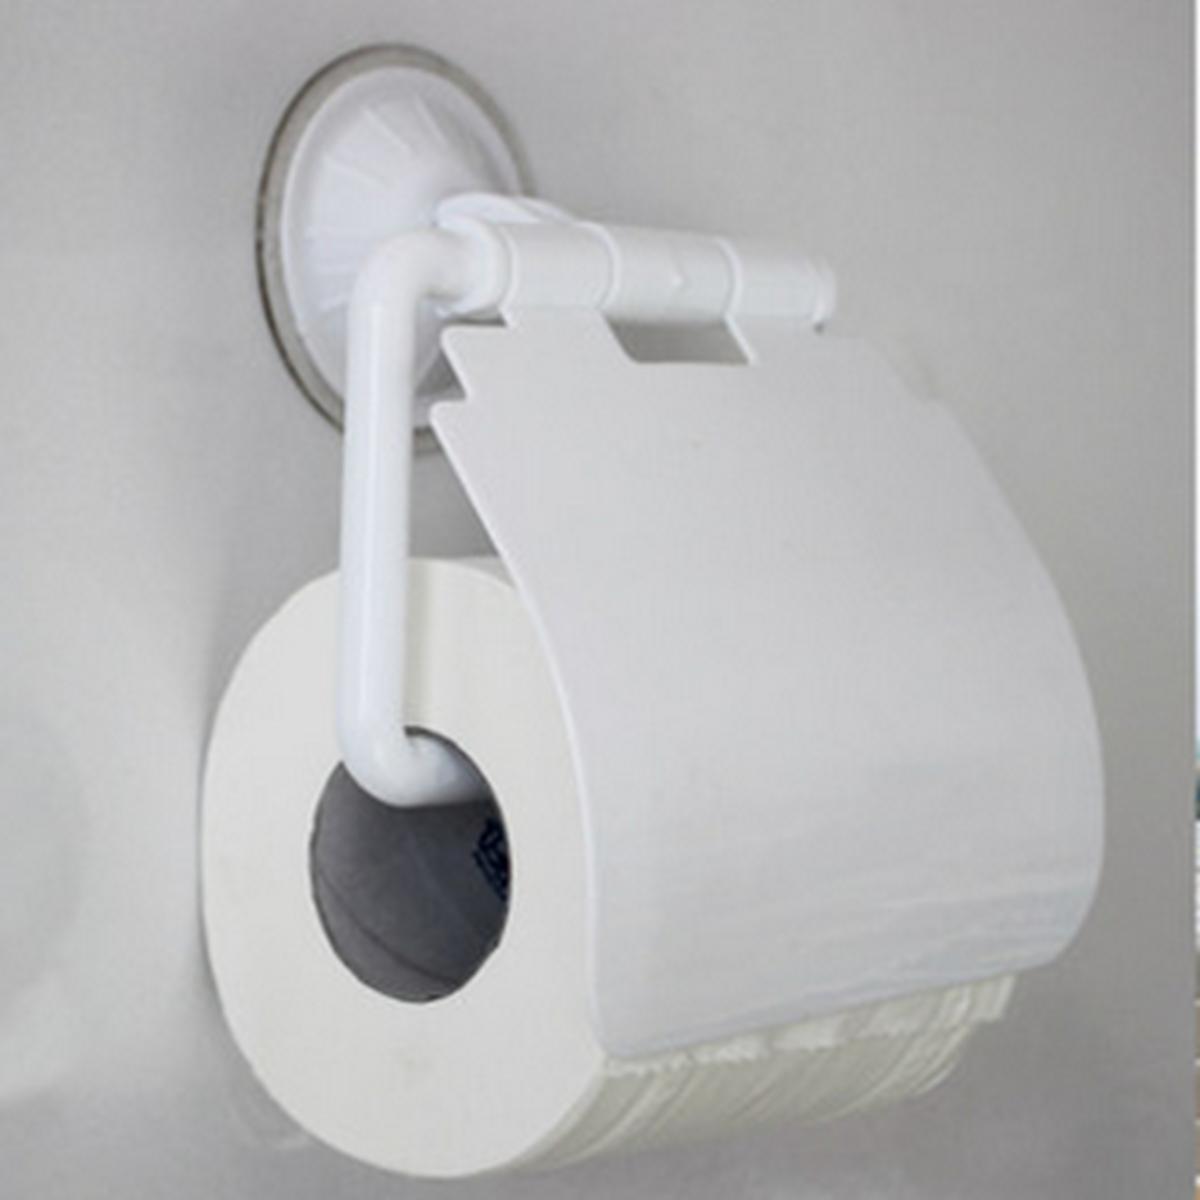 bathroom sucker wall mounted toilet paper holder cover roll tissue box hanger. Black Bedroom Furniture Sets. Home Design Ideas